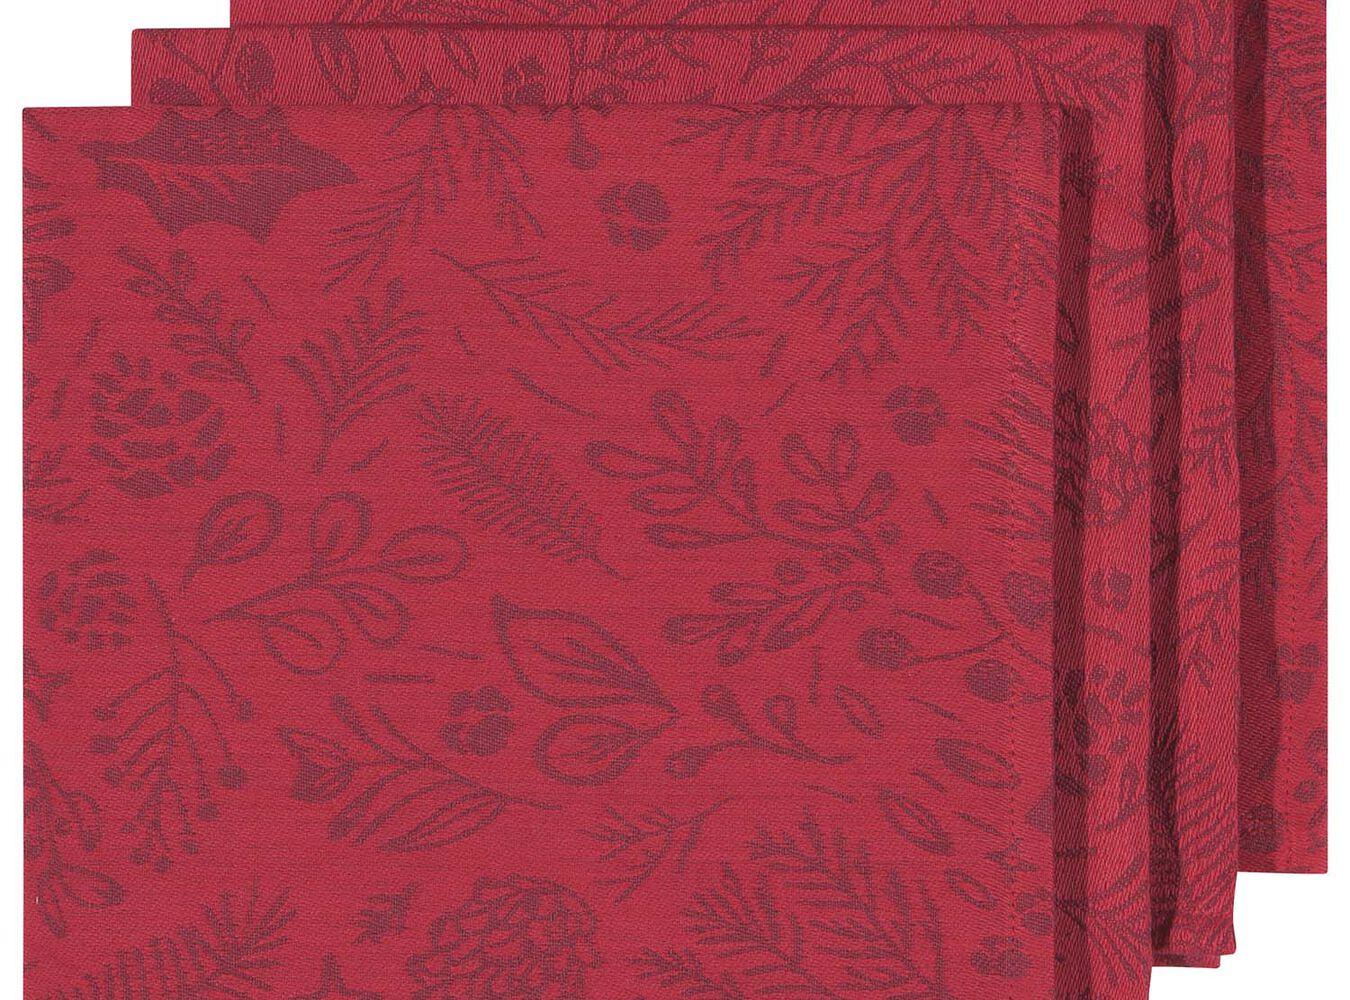 Jacquard Woodland Napkins, Set of 4 | Sur La Table